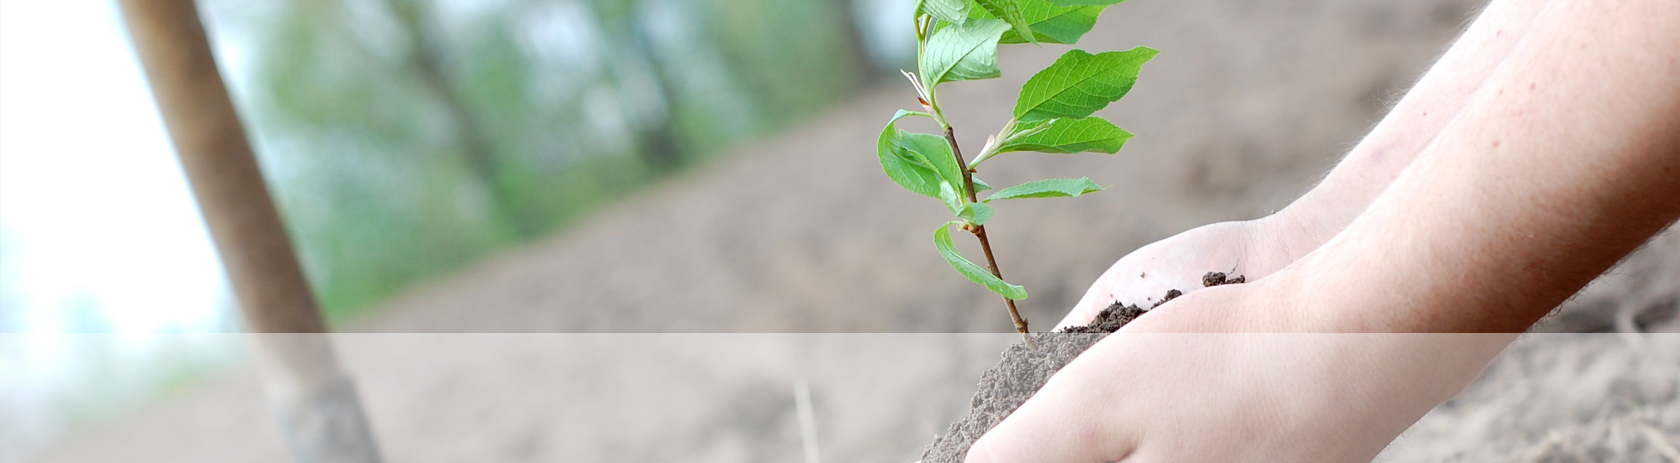 SLIDERS-HOME-plant a tree